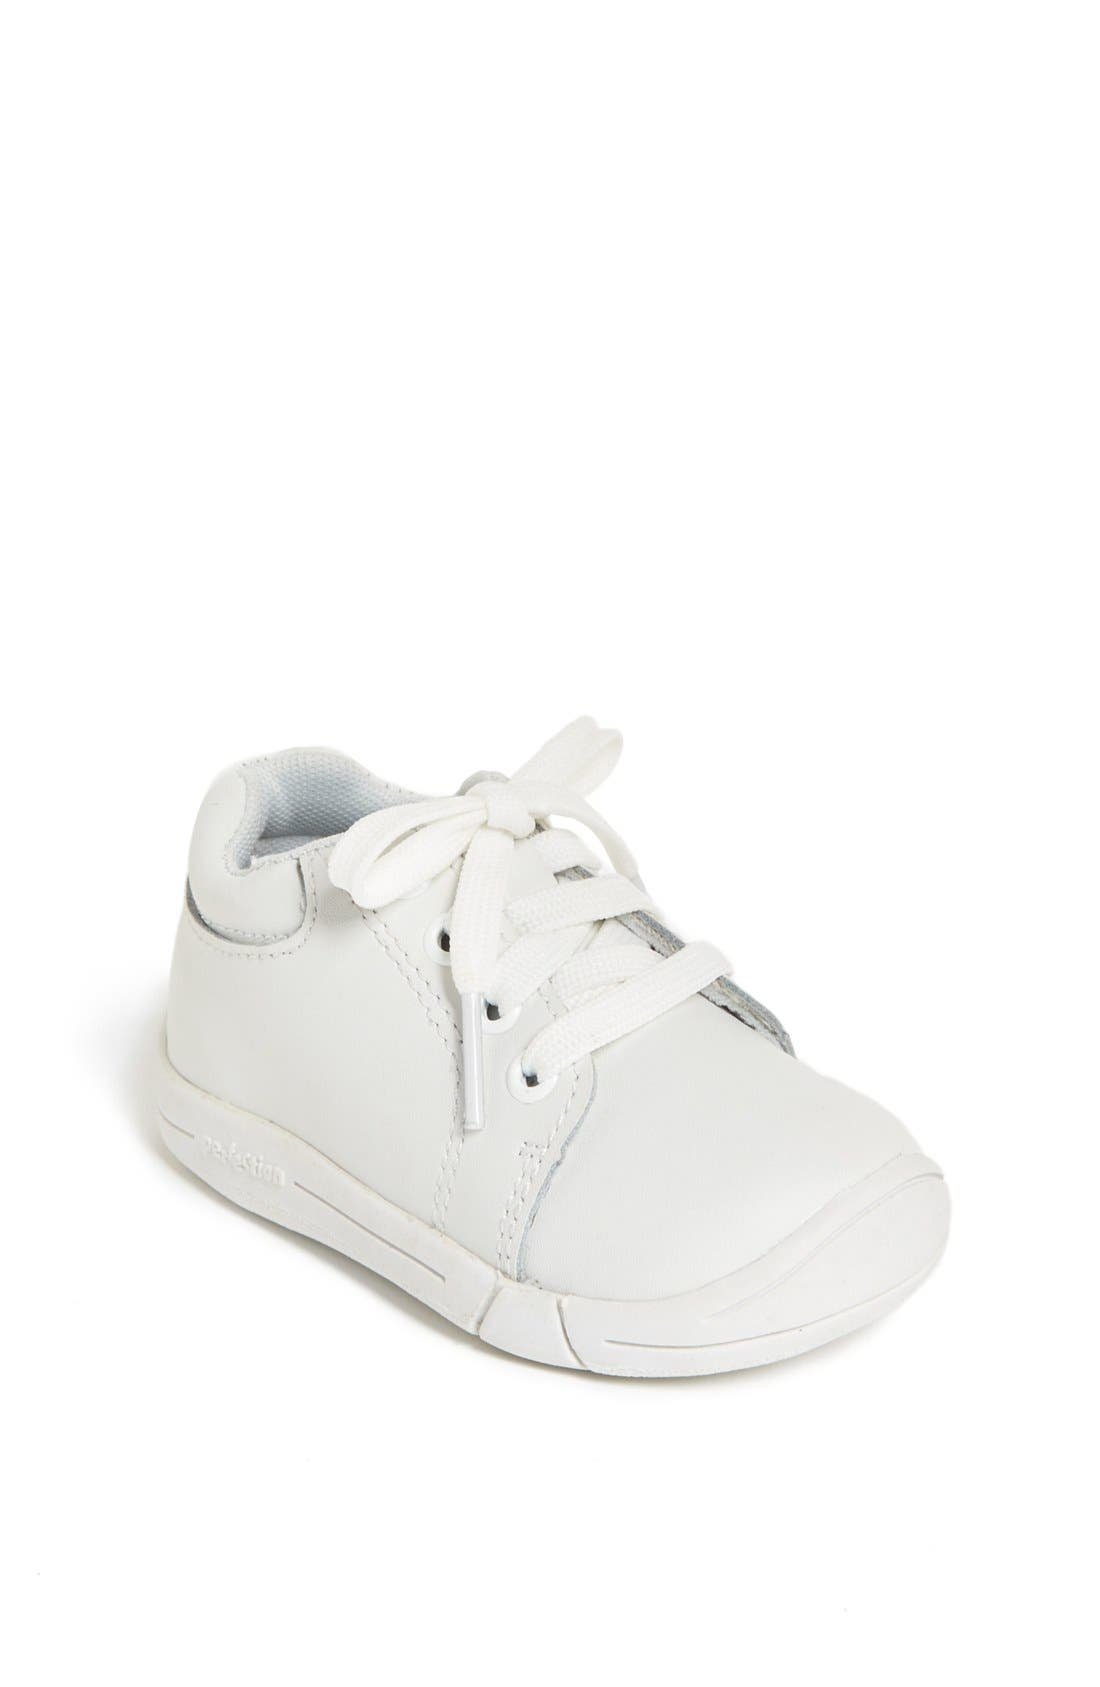 Alternate Image 1 Selected - Jumping Jacks 'Perfection' Sneaker (Baby, Walker & Toddler)